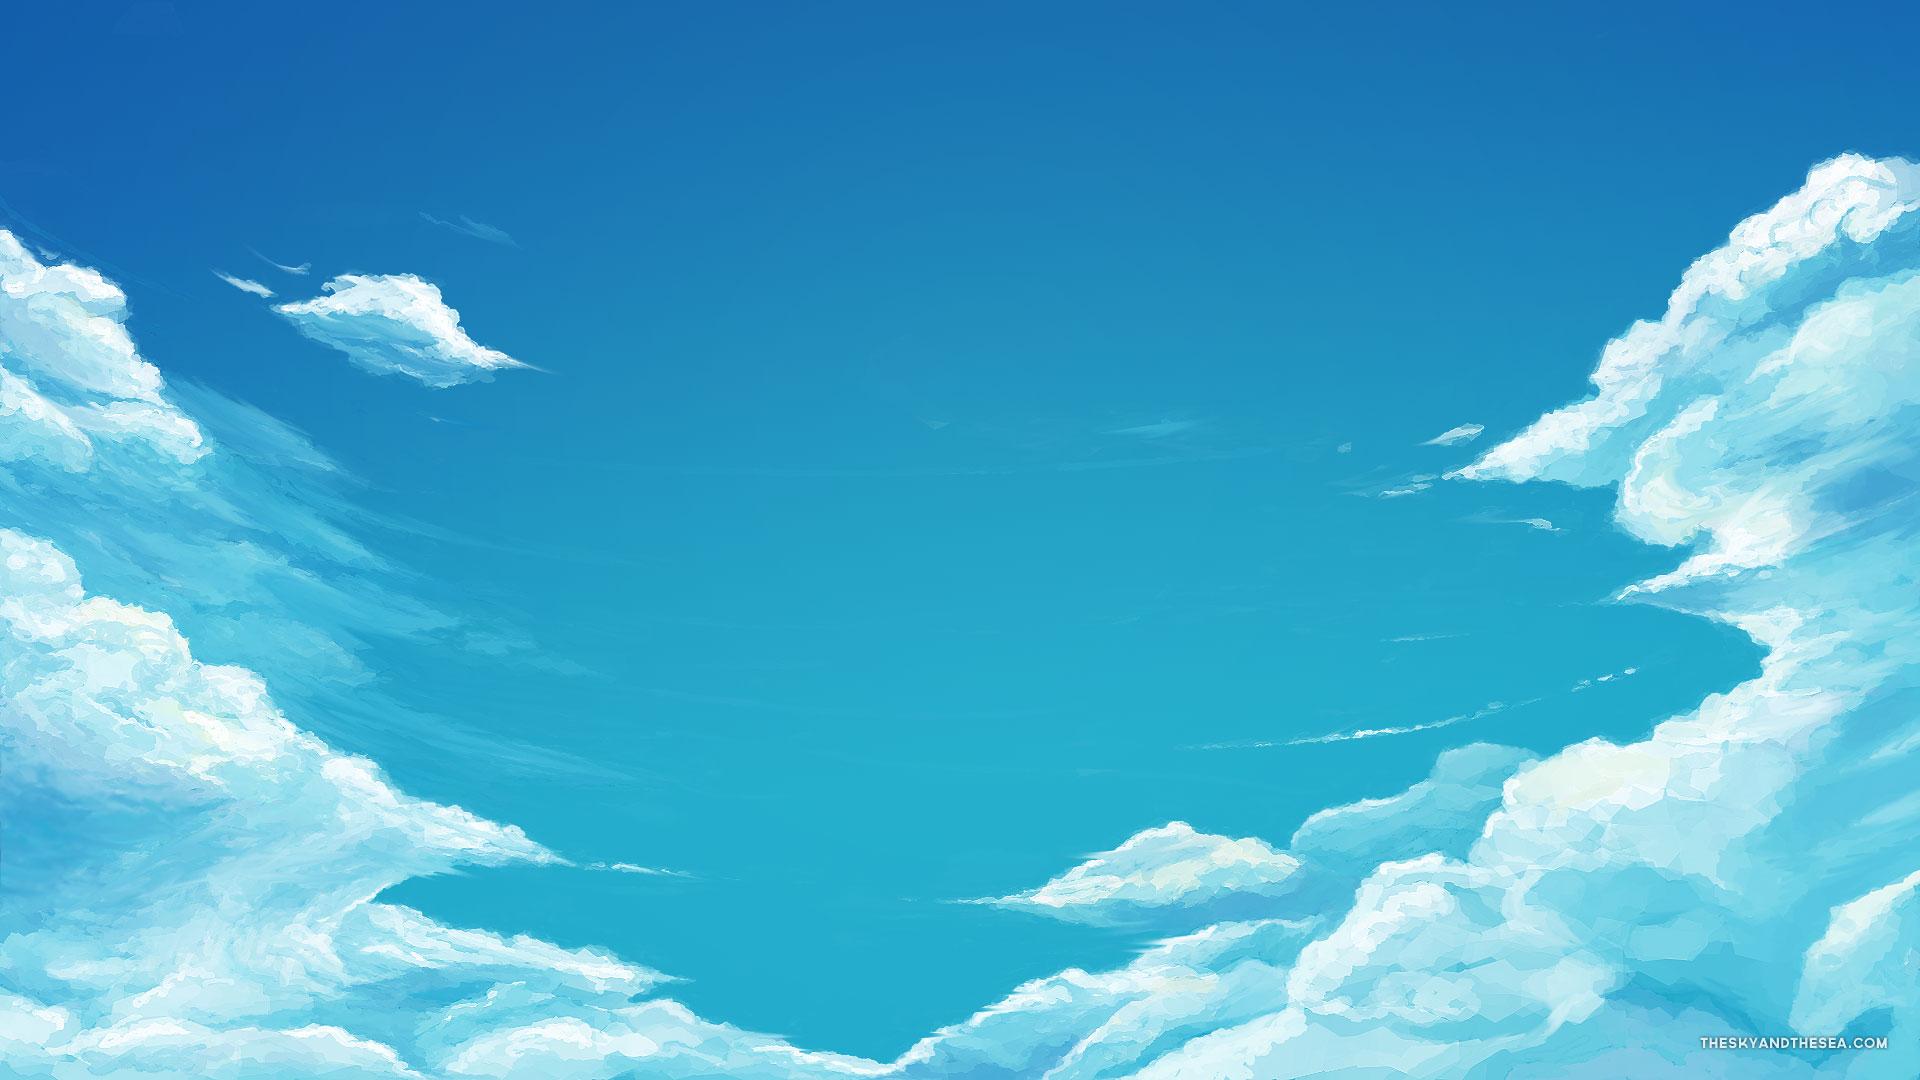 Cartoon blue sky wallpaper 1920x1080